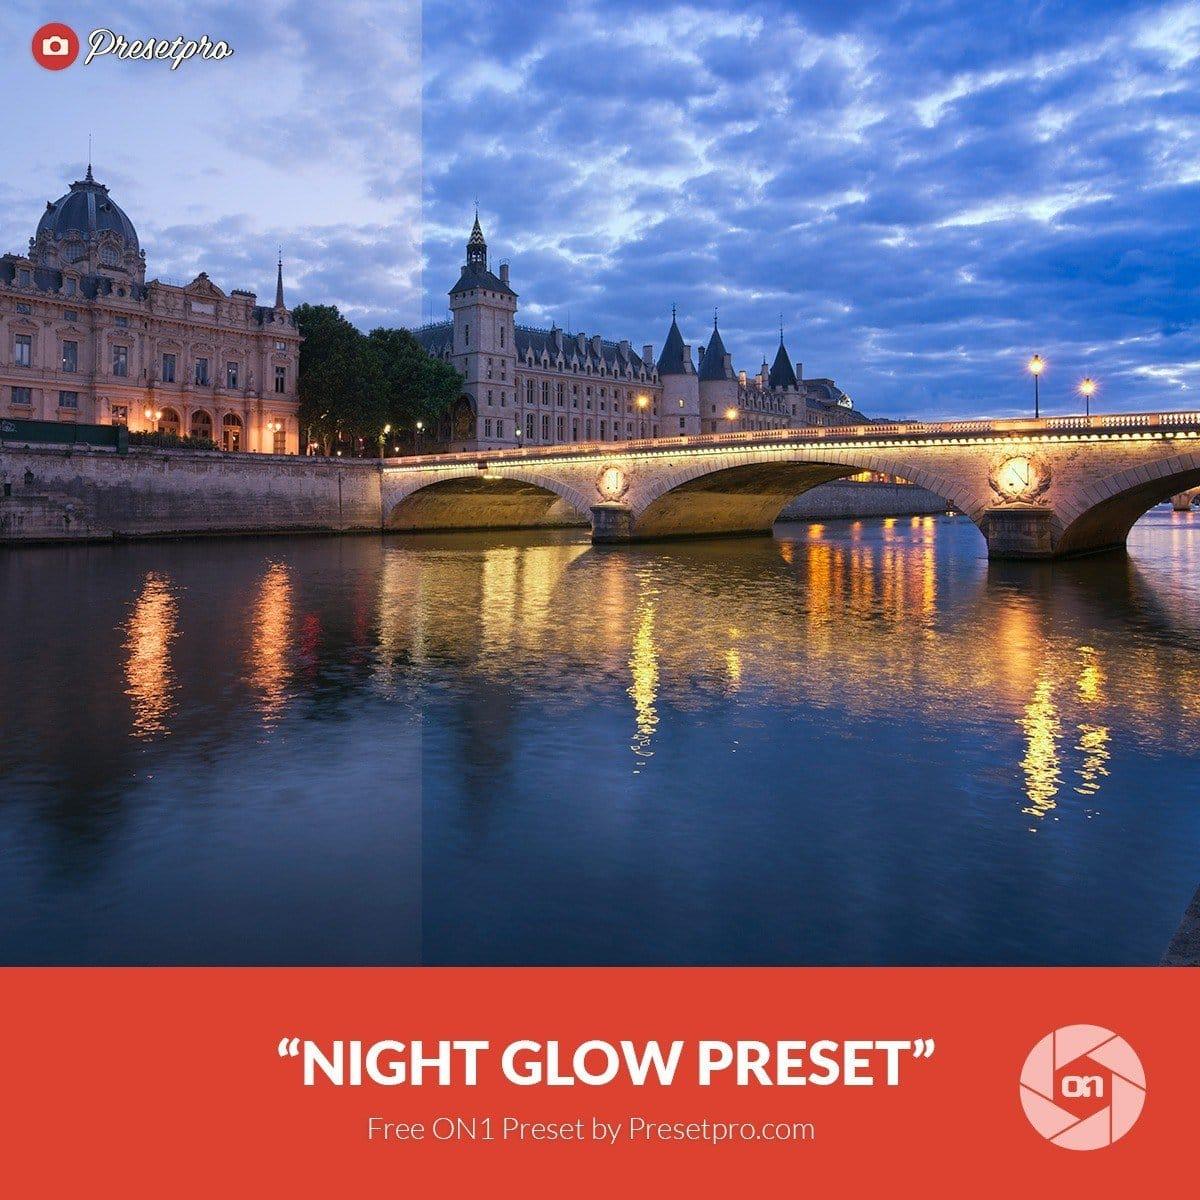 Free-On1-Preset-Night-Glow-Presetpro.com